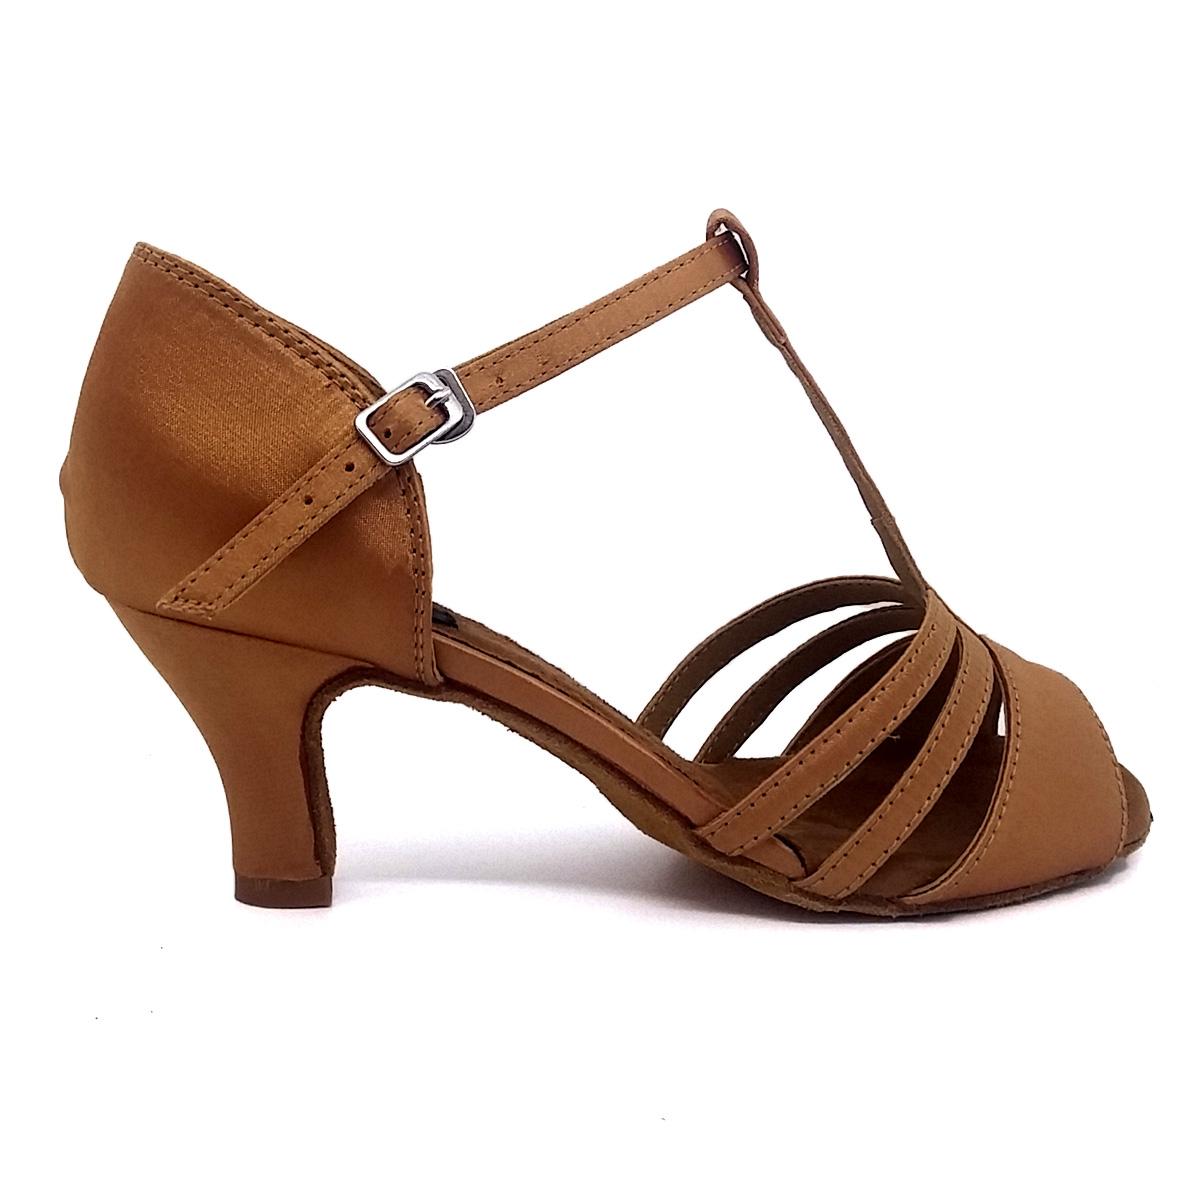 zapato de baile bajito